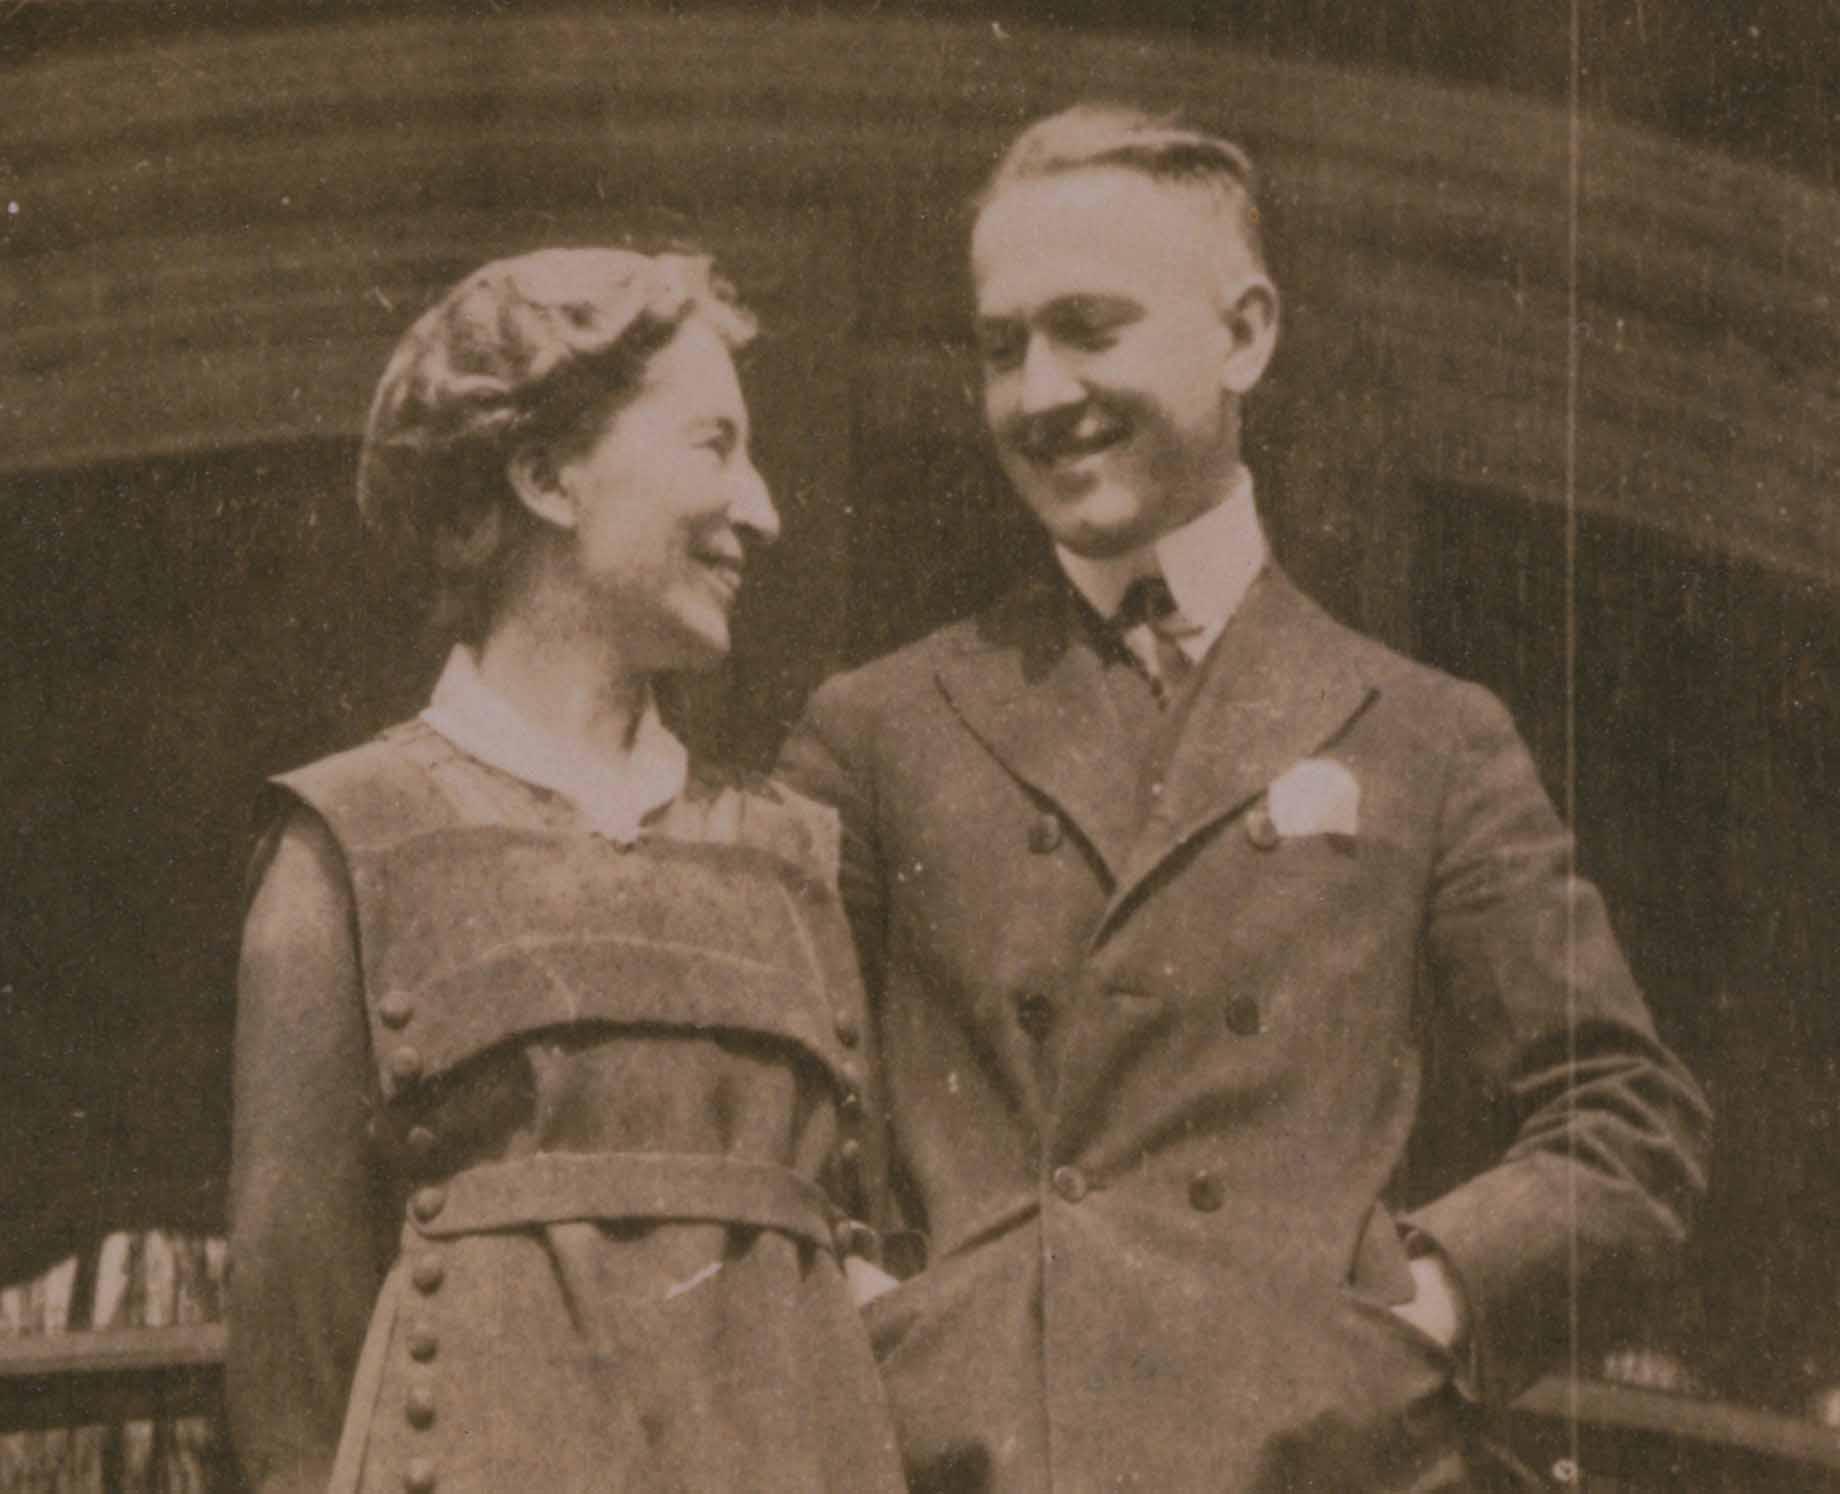 Principia founder, Mary Kimball Morgan with her son William Morgan Jr.